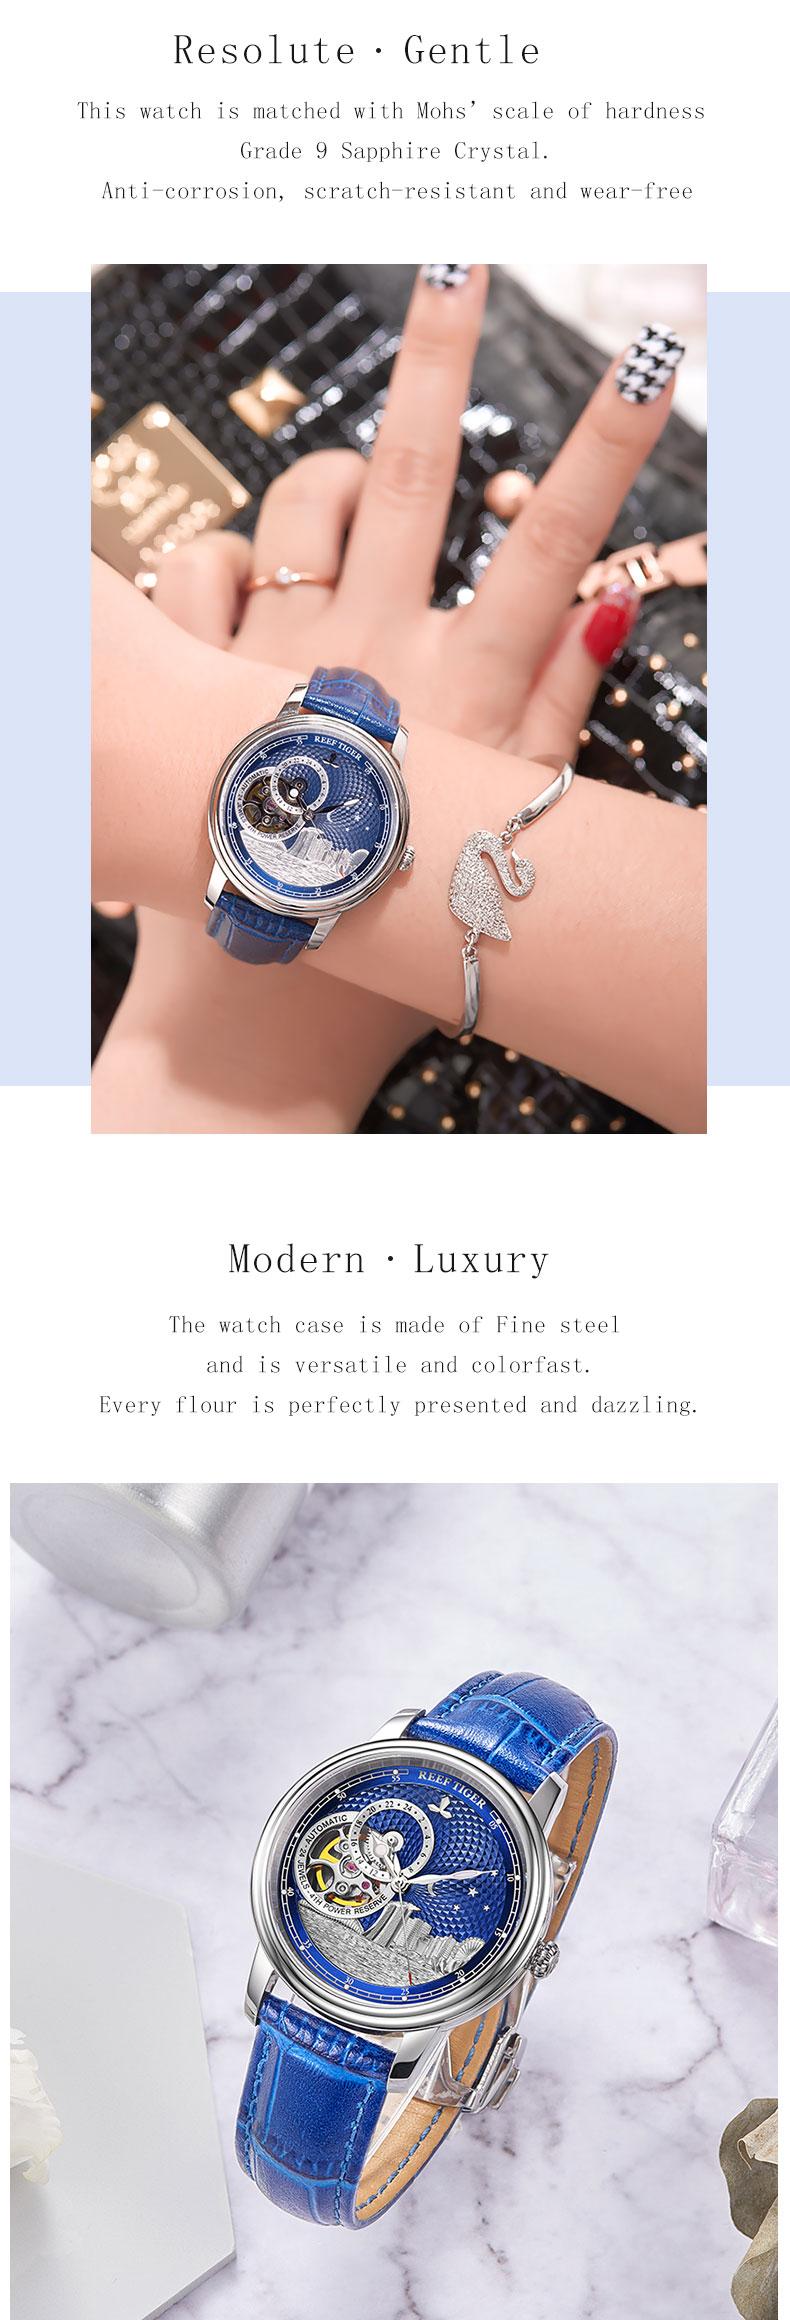 Reef Tiger/RT Blue Tourbillon Automatic Watch Luxury Fashion Watch for Women Men Unisex Watches 2019 New Clock Reloj RGA1739